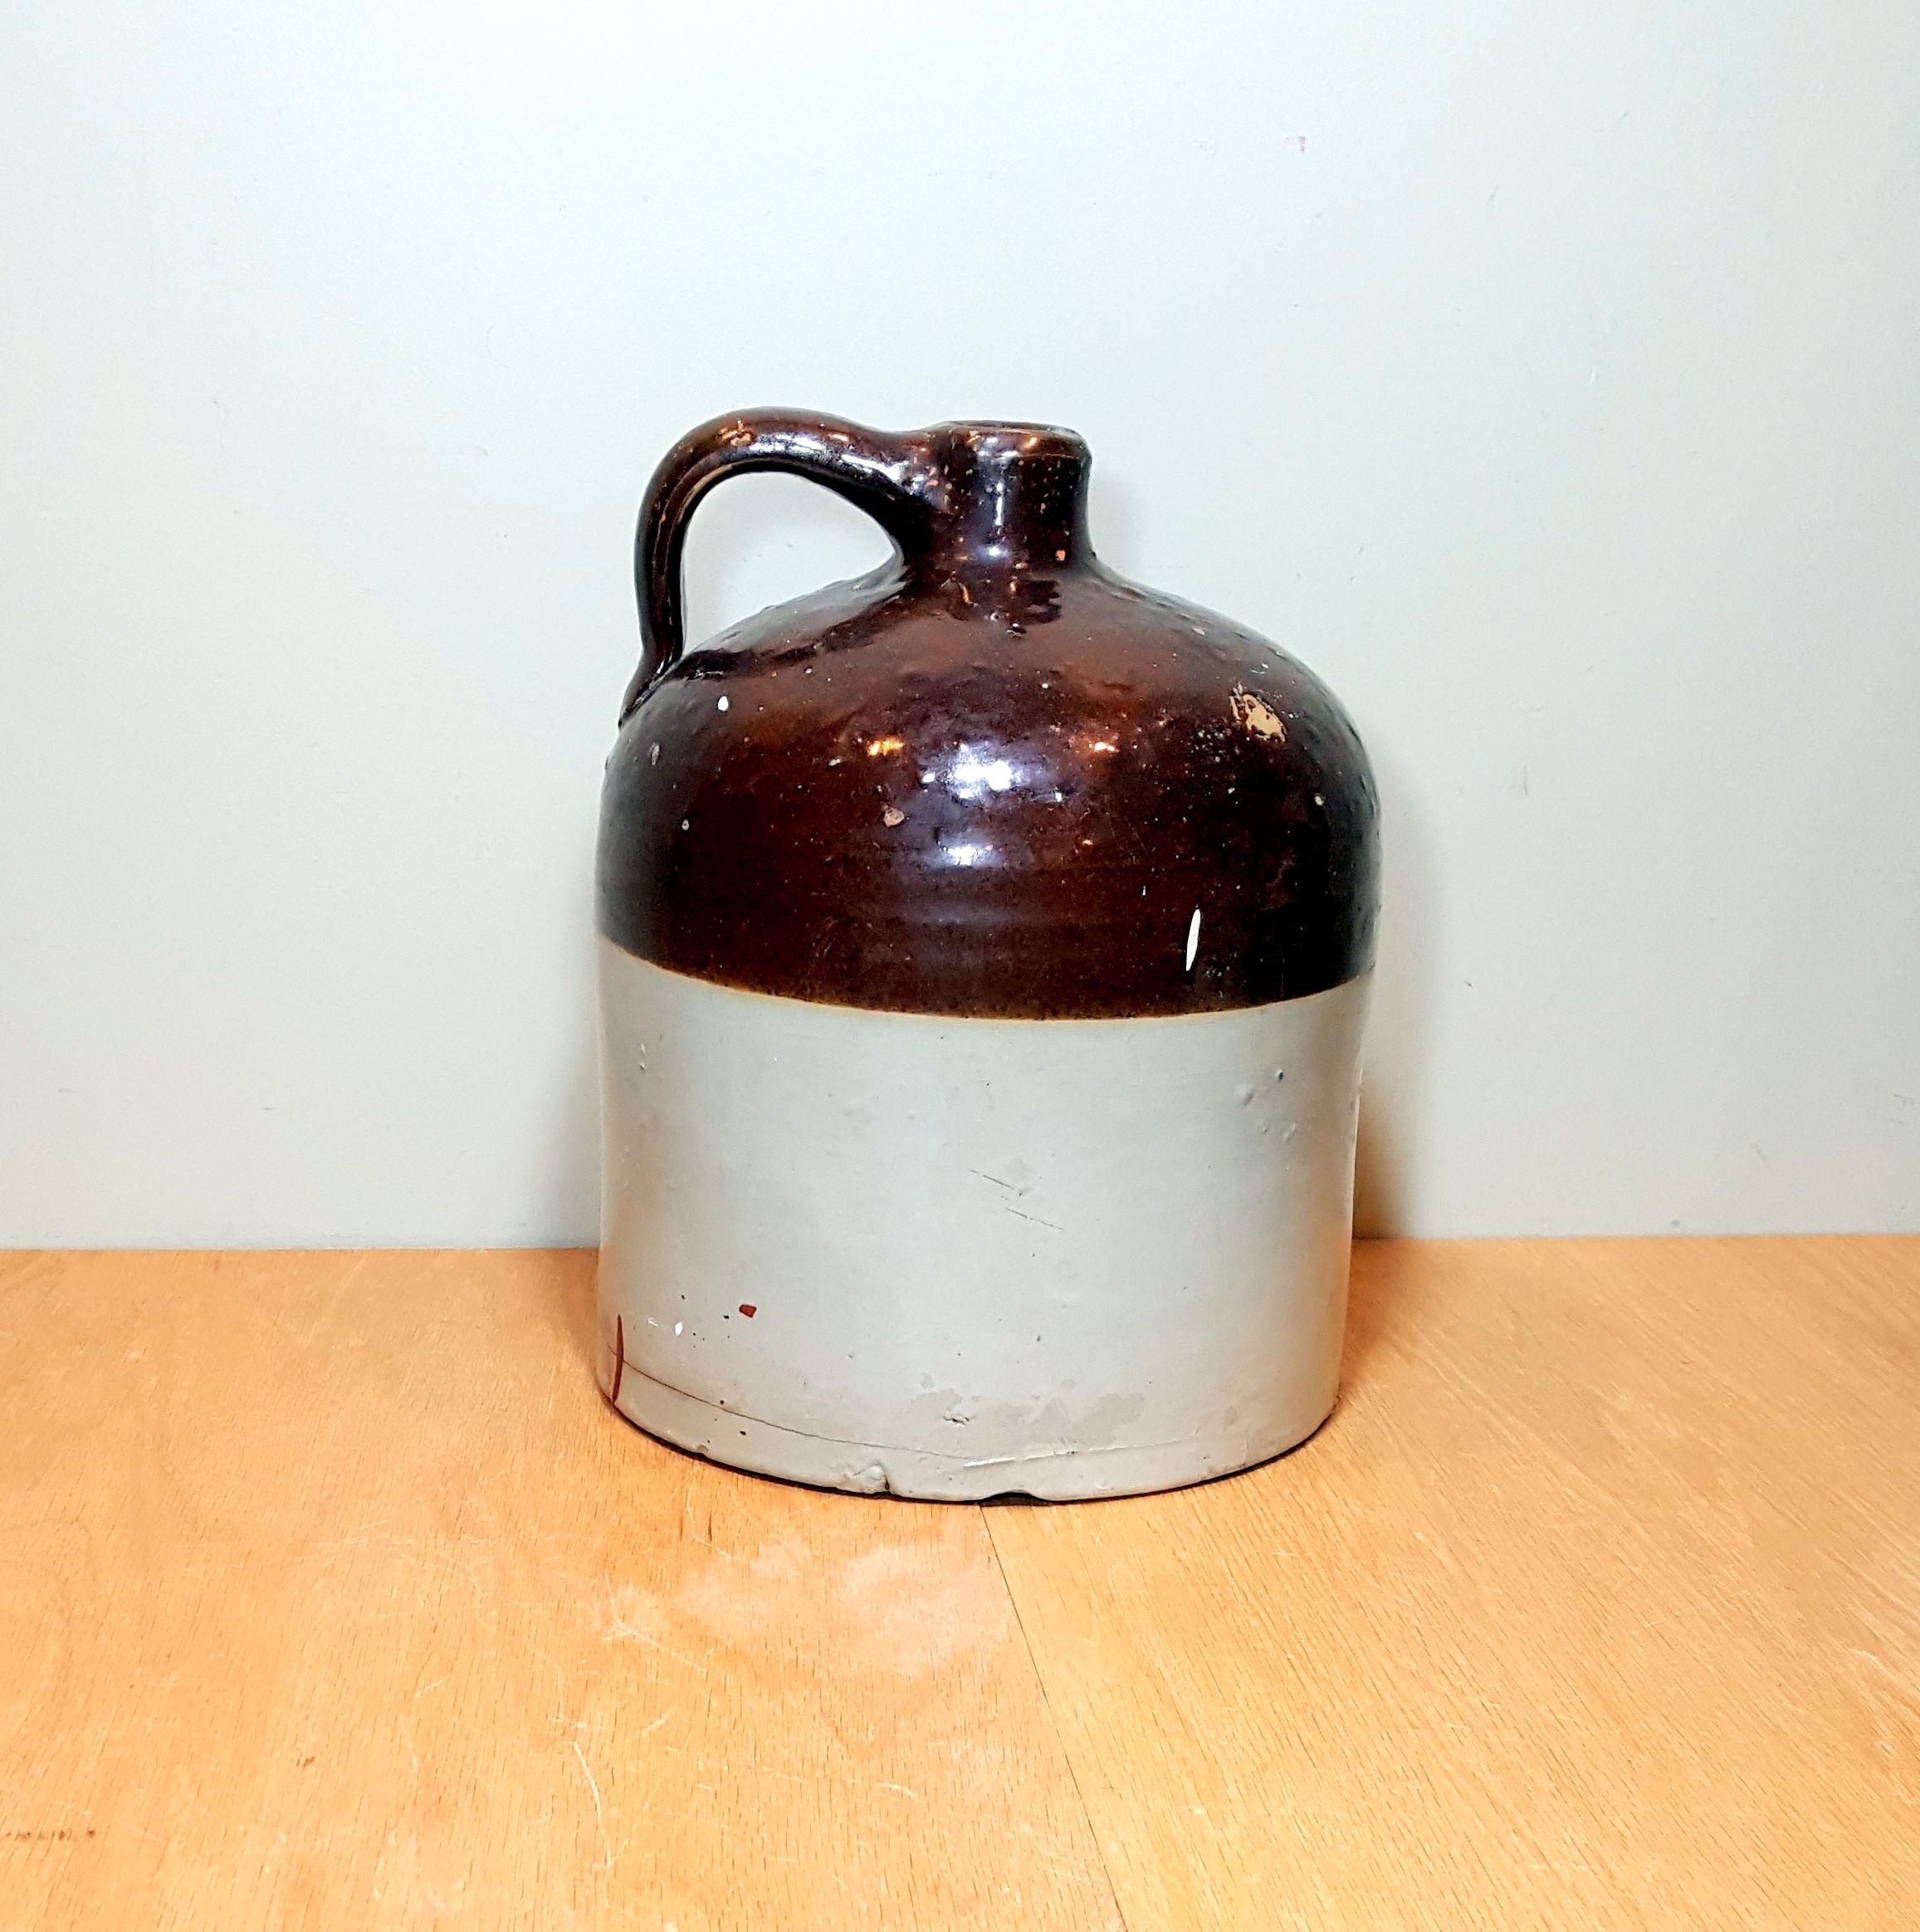 PRIMITIVE ANTIQUE JUG Crockery Pottery Vintage Rustic